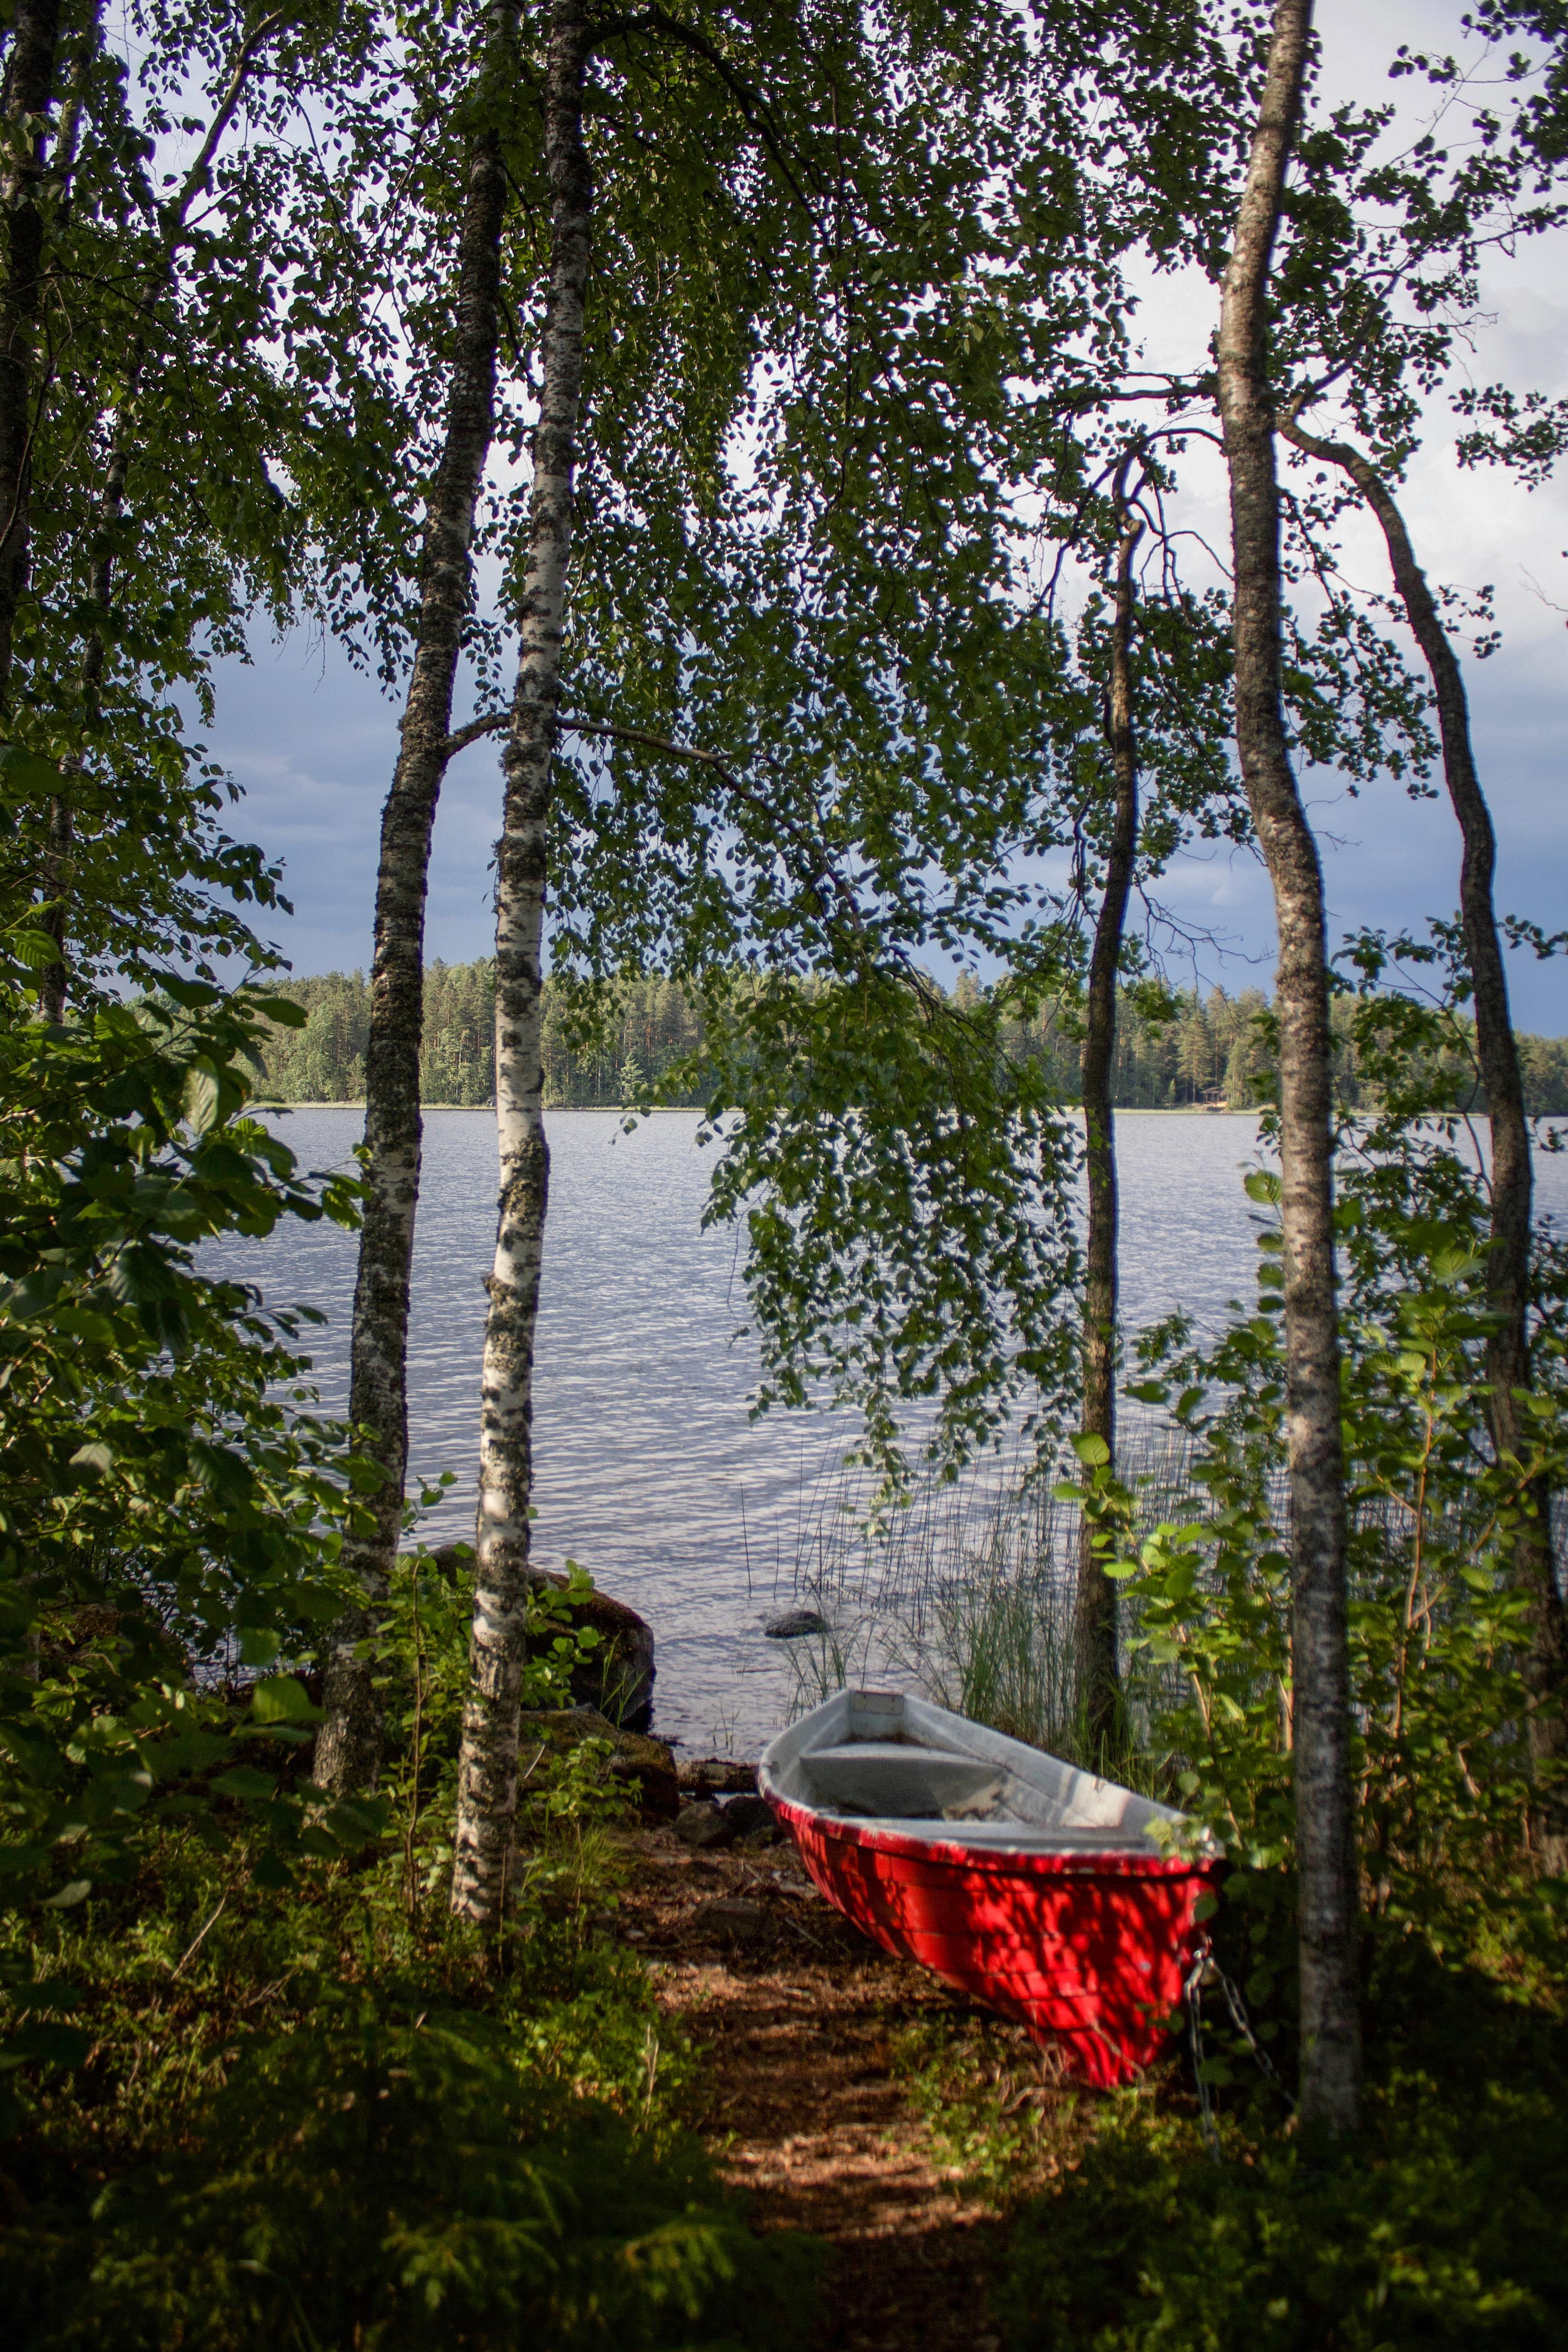 Saimaa, Finland, Lake Bohinj slovenia, lake constance, switzerland, germany, austria, lake, views stays europe vacation lindau summer 2021 holiday experience localbini biniblog